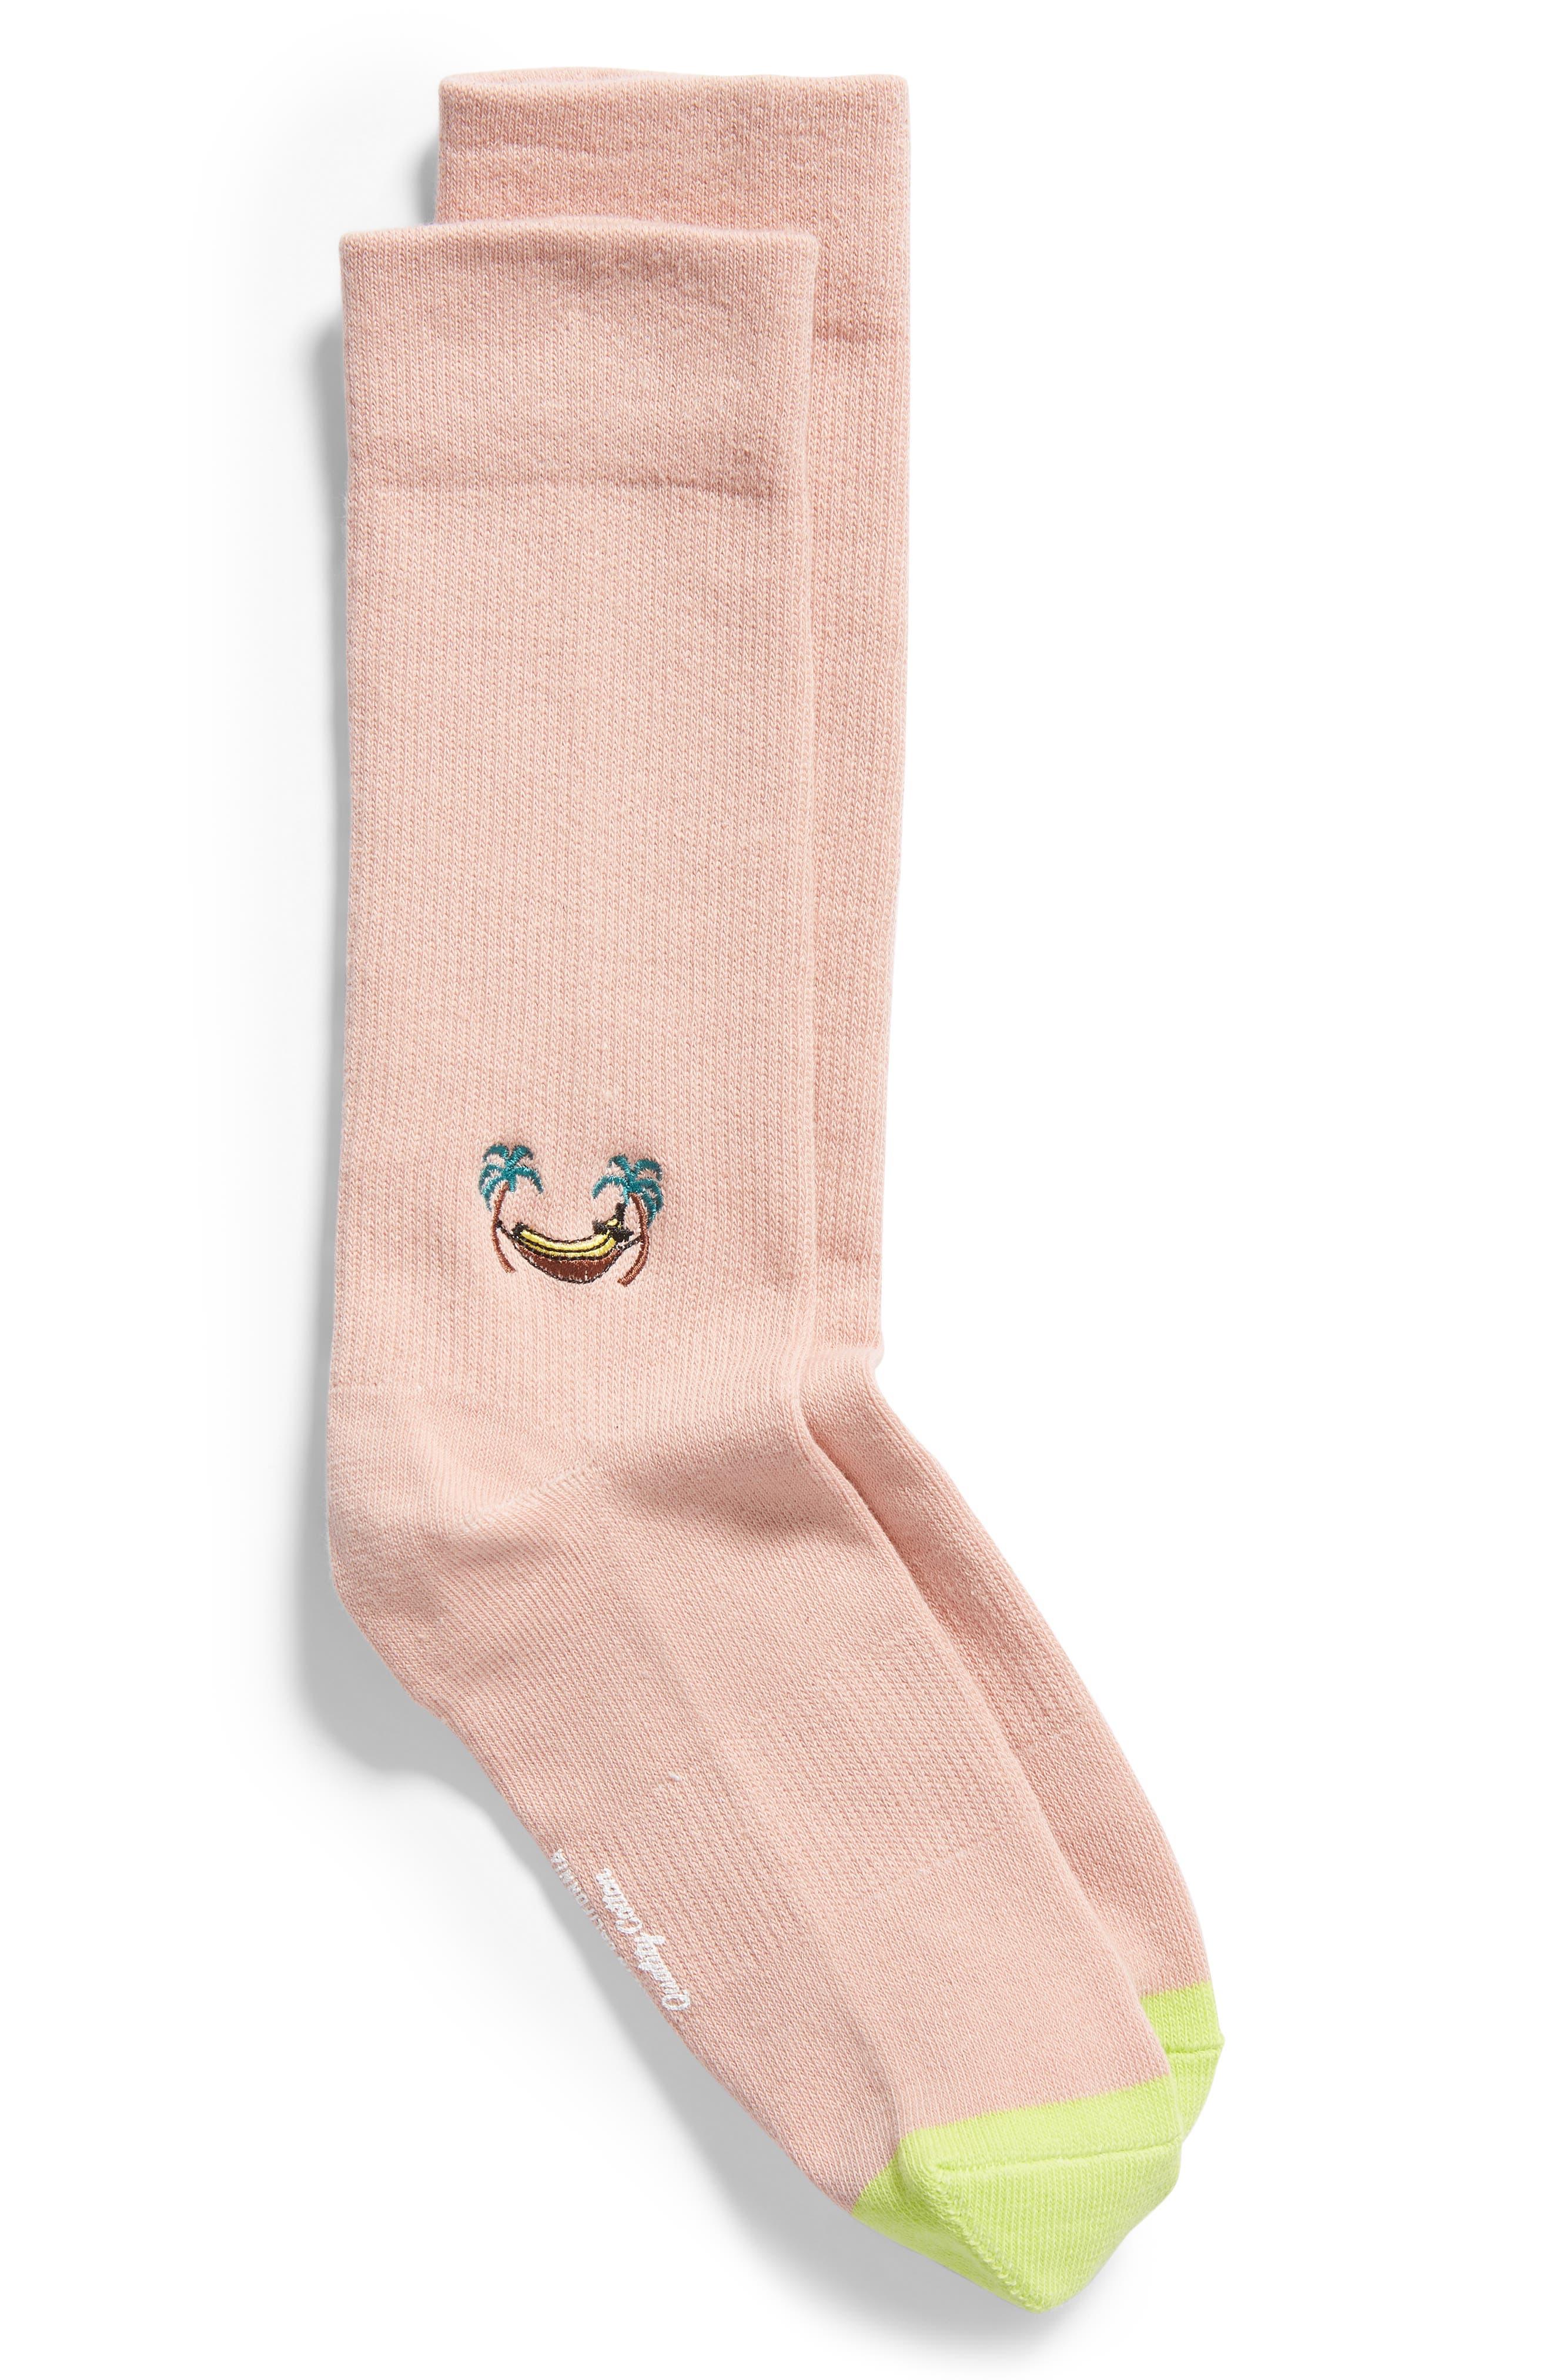 RICHER POORER Banana Everyday Crew Socks in Pink